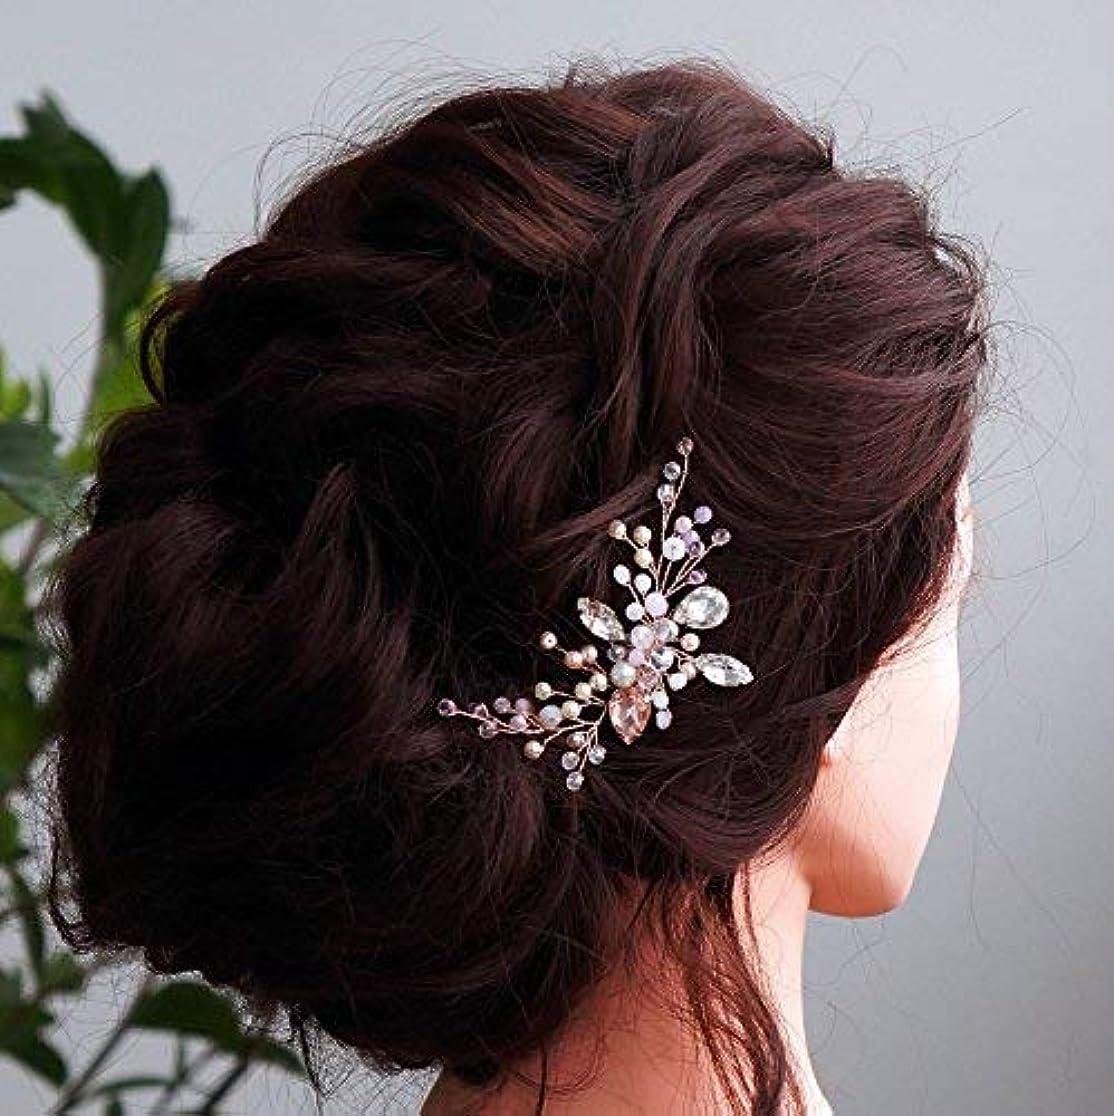 Kercisbeauty Wedding Bridal Bridesmaids Flower Girl Pink Crystal Beads and Rhinestone Tiny Cute Hair Comb Headband...